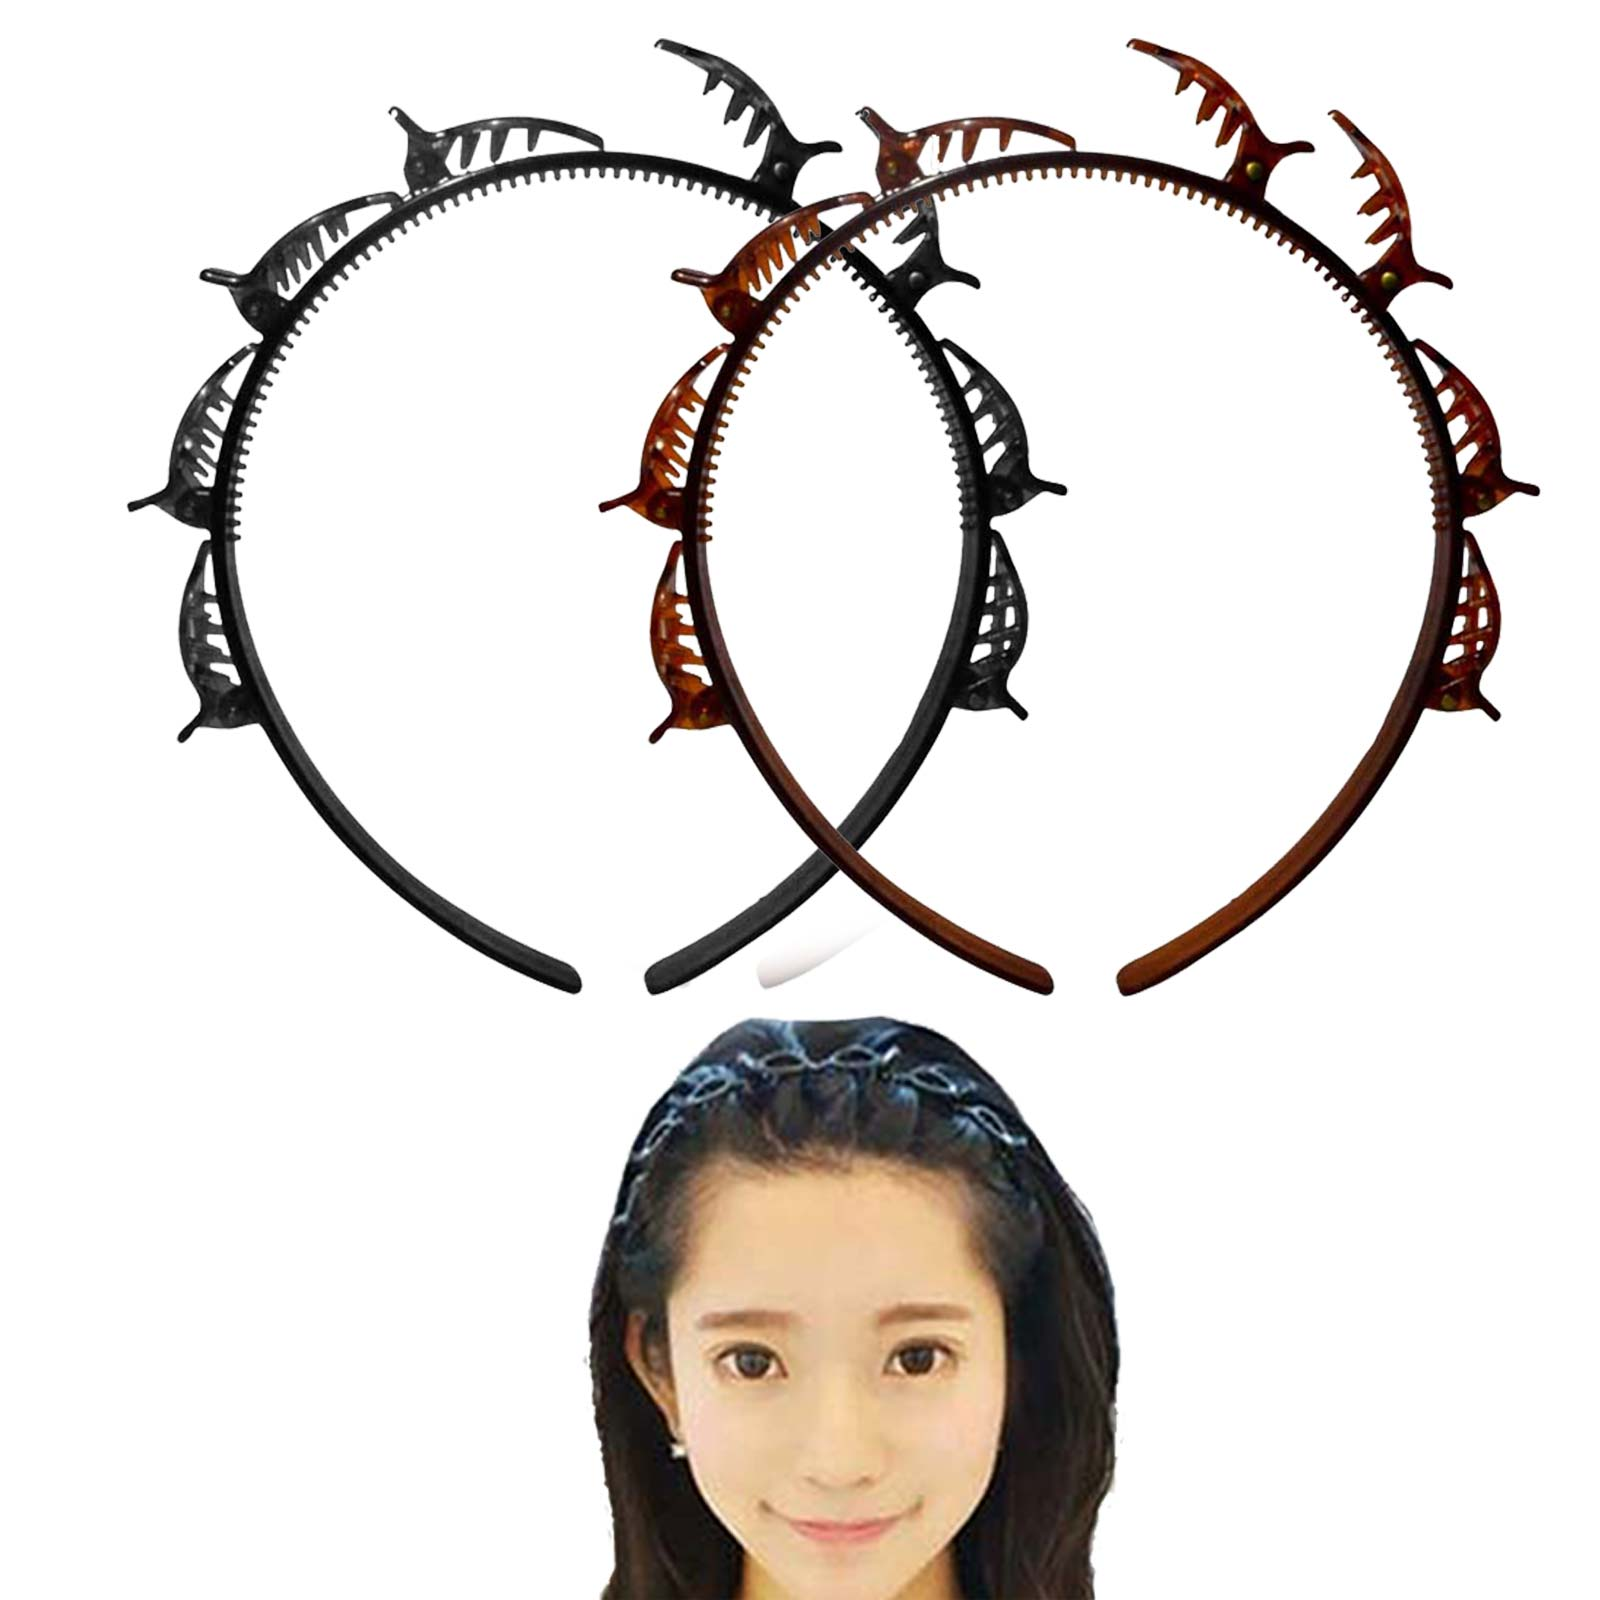 Kit 02 Tiara Com Presilhas Hair Twister Para Penteados De Cabelo